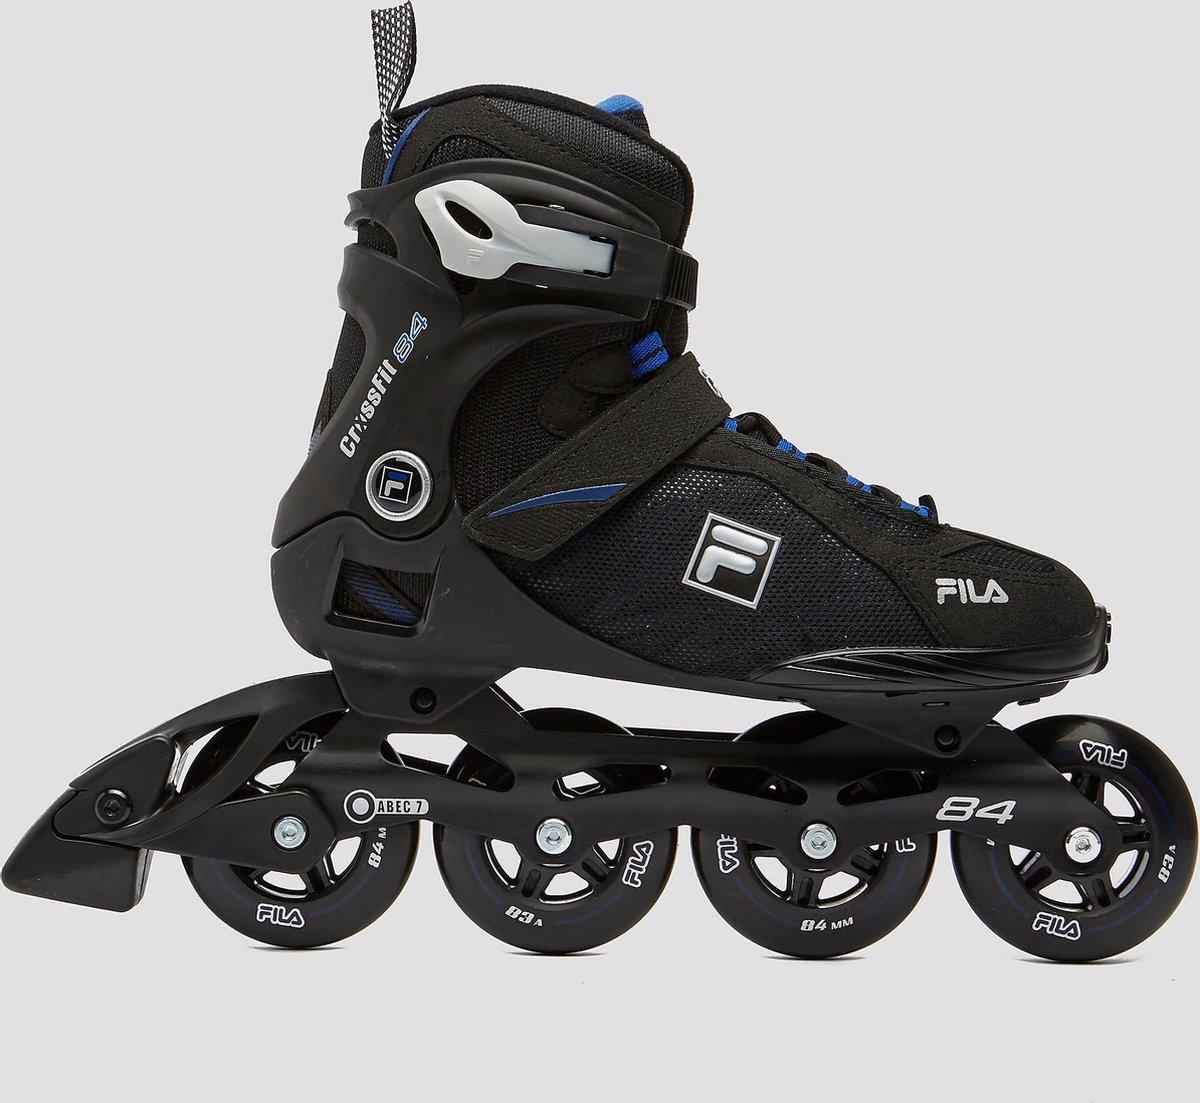 Fila Crossfit 84 Inline Skates/Skeelers Zwart/Blauw Volwassenen